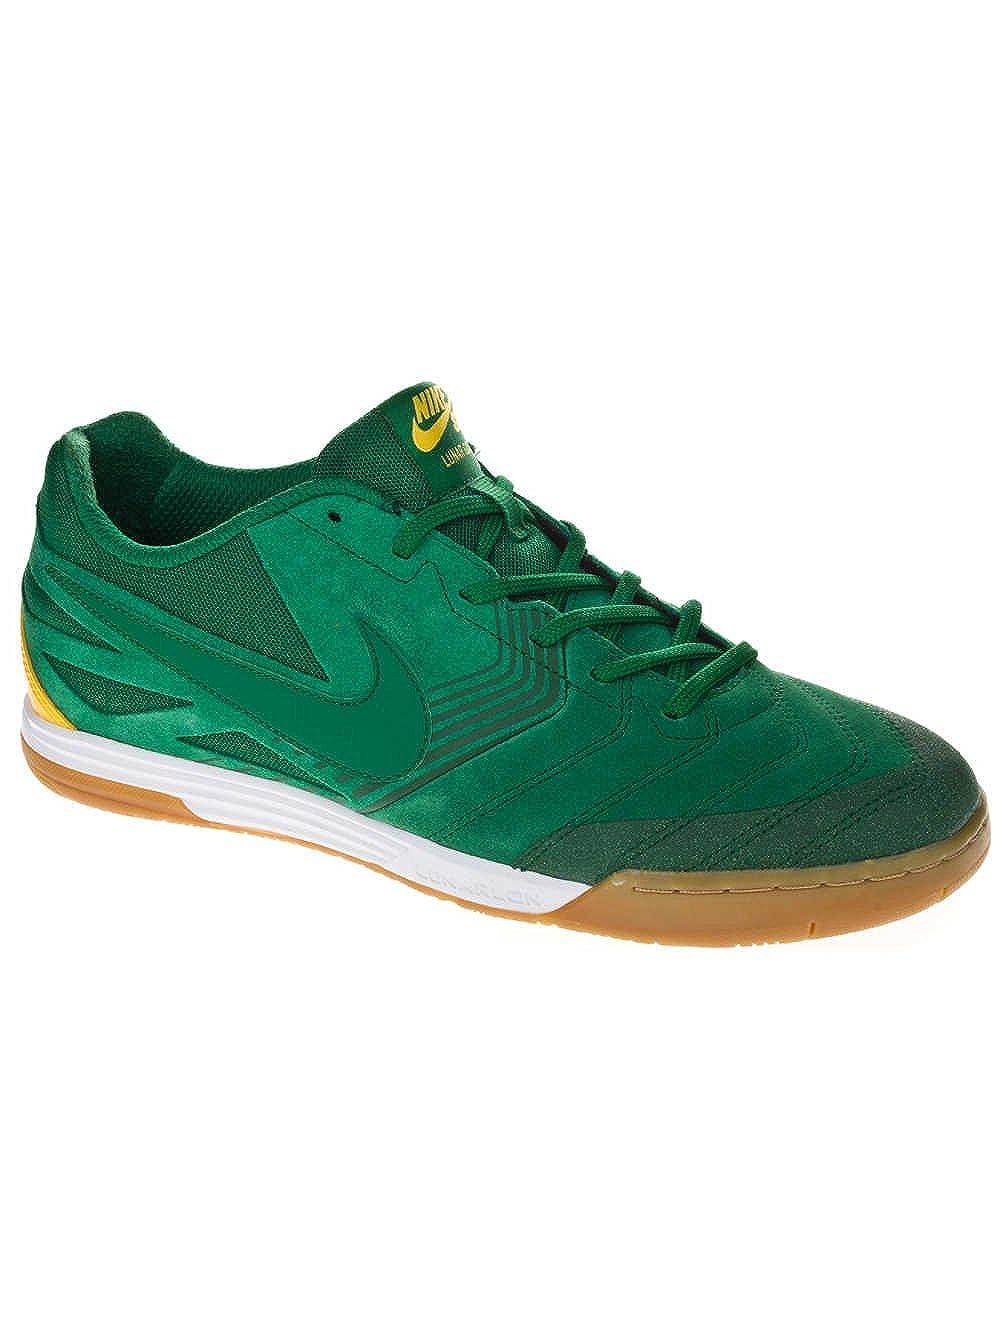 85a16035a943 Nike Sneaker Men SB Lunar Gato WC Sneakers  Amazon.co.uk  Shoes   Bags